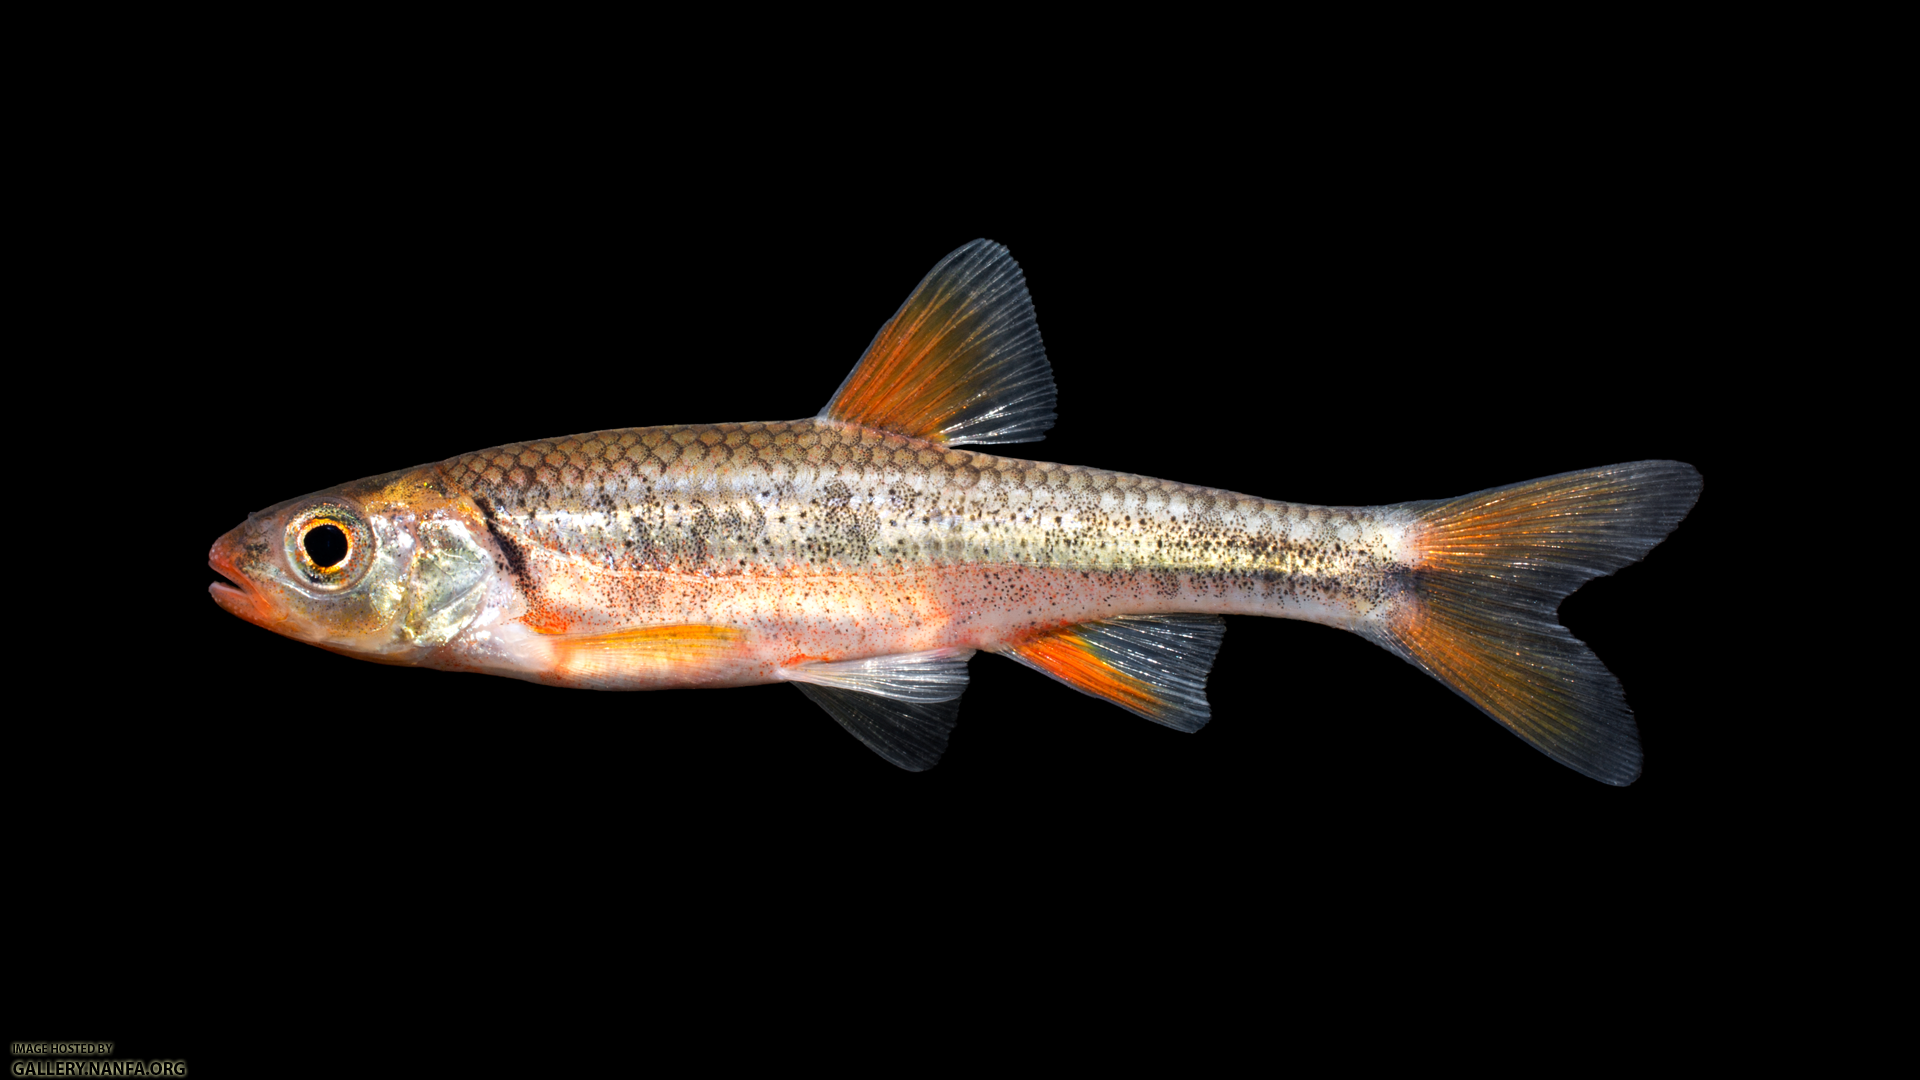 Notropis-chiliticus-04.png